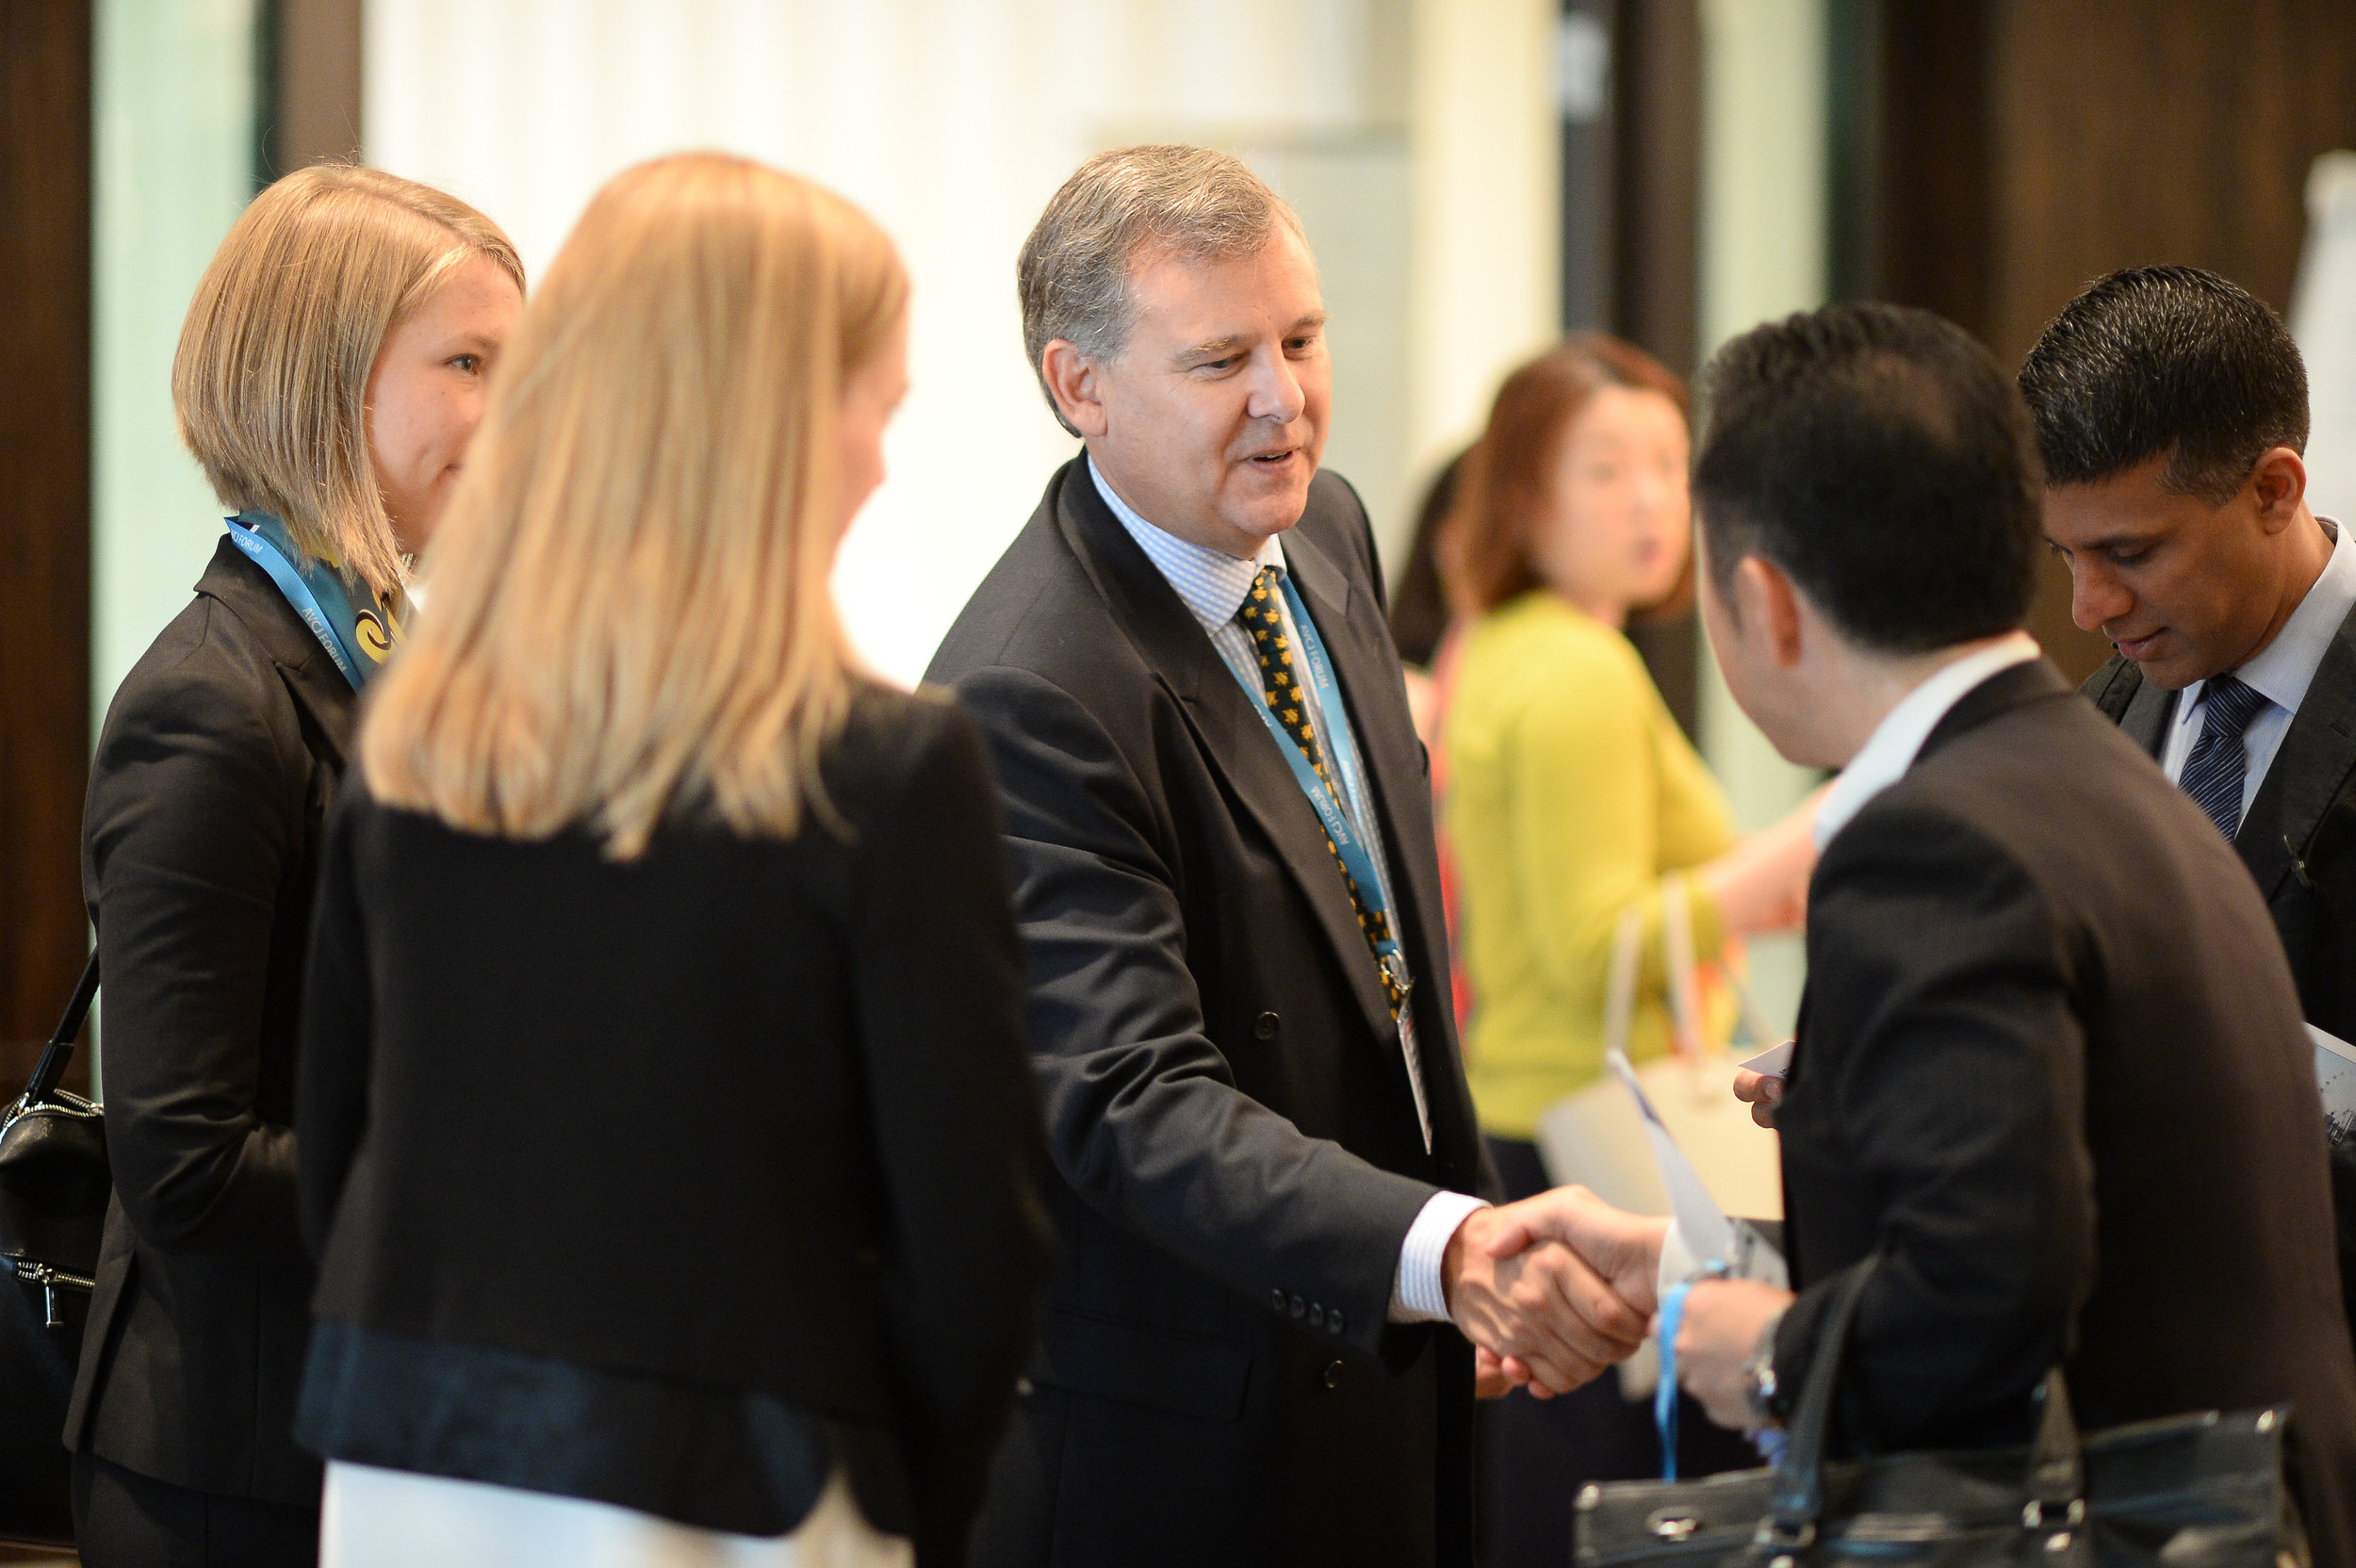 AVCJ Esg Forum 2016-37.jpg